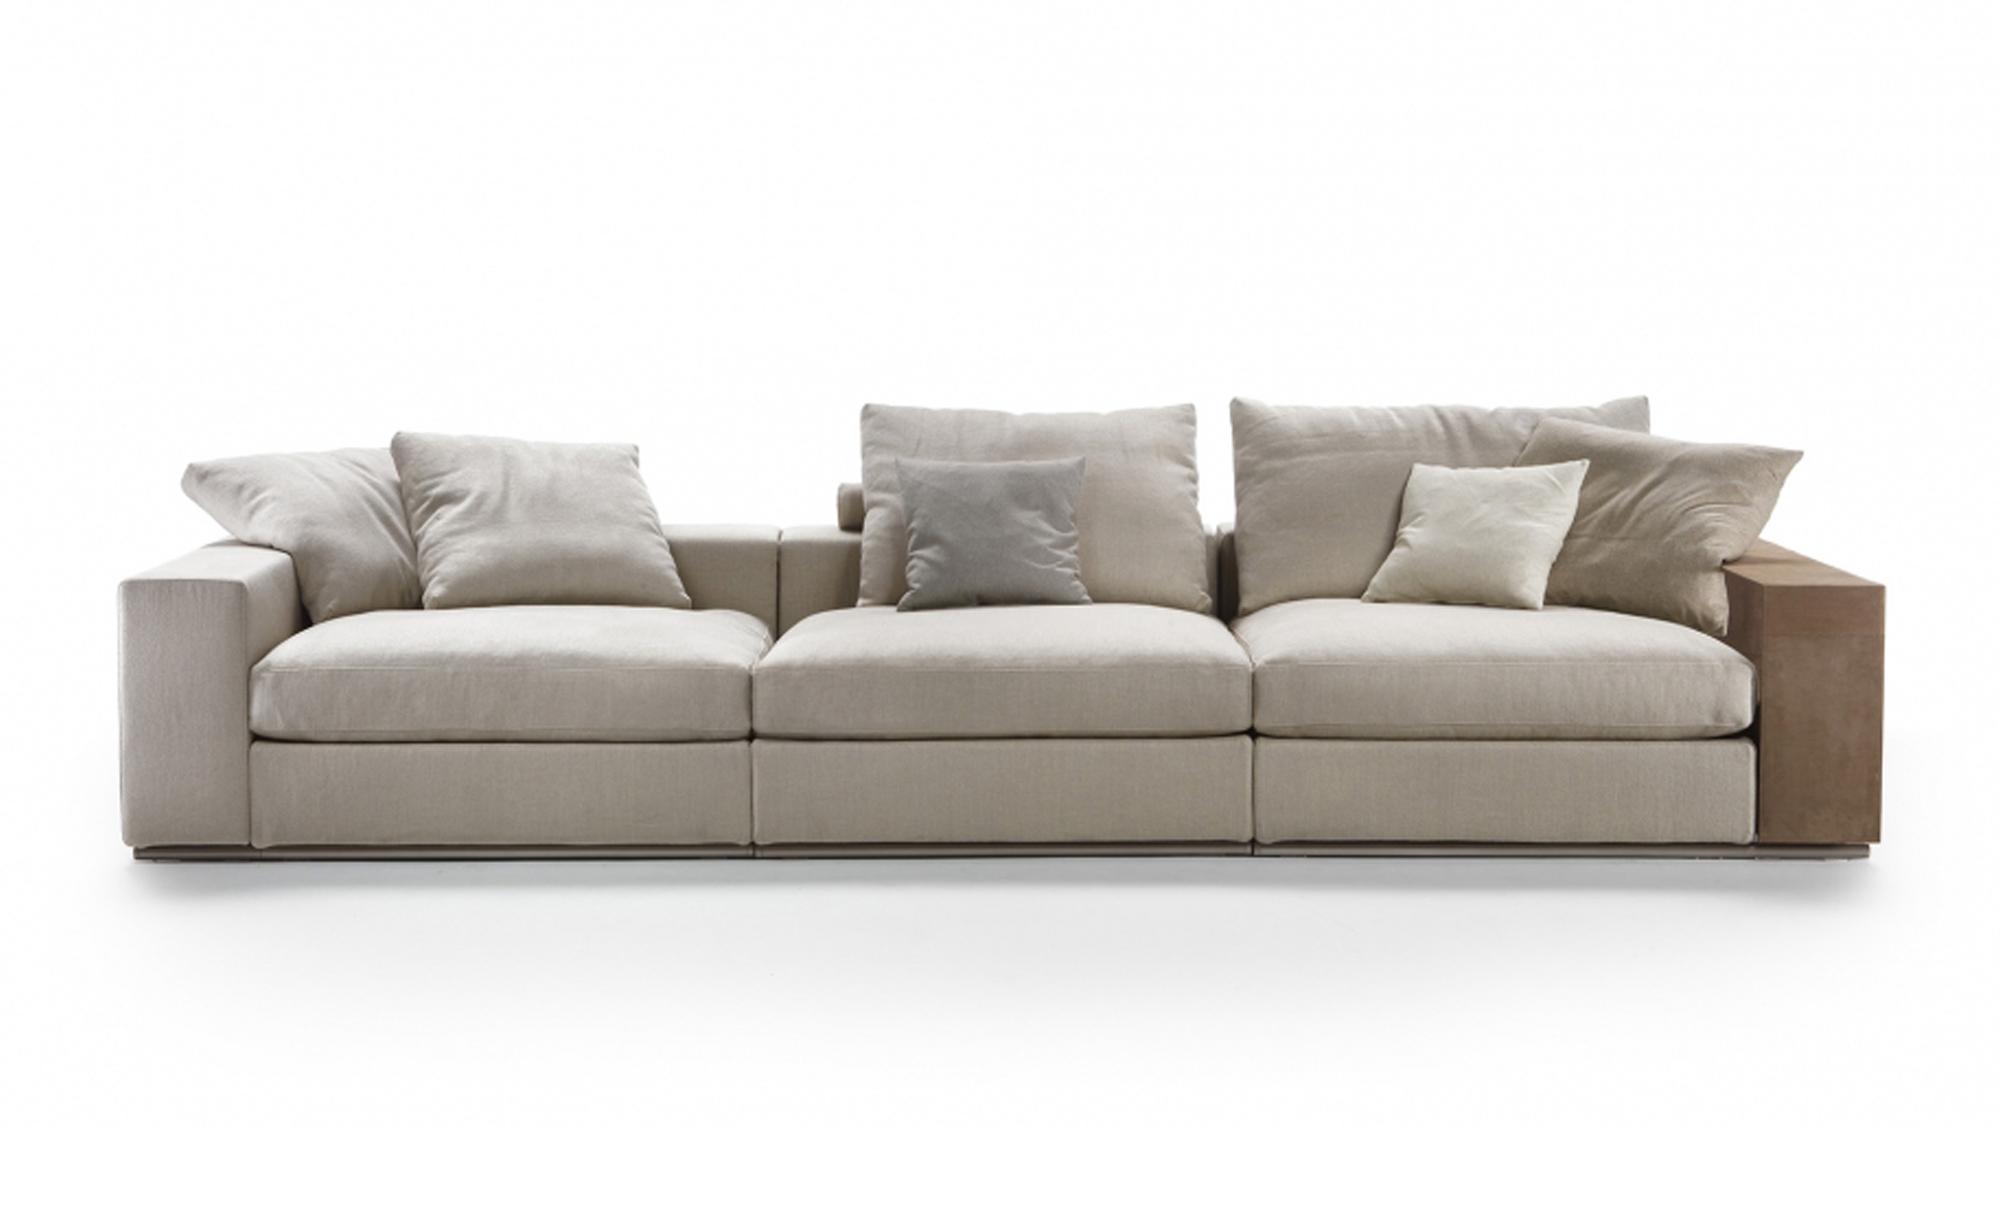 groundpiece sofas fanuli furniture. Black Bedroom Furniture Sets. Home Design Ideas